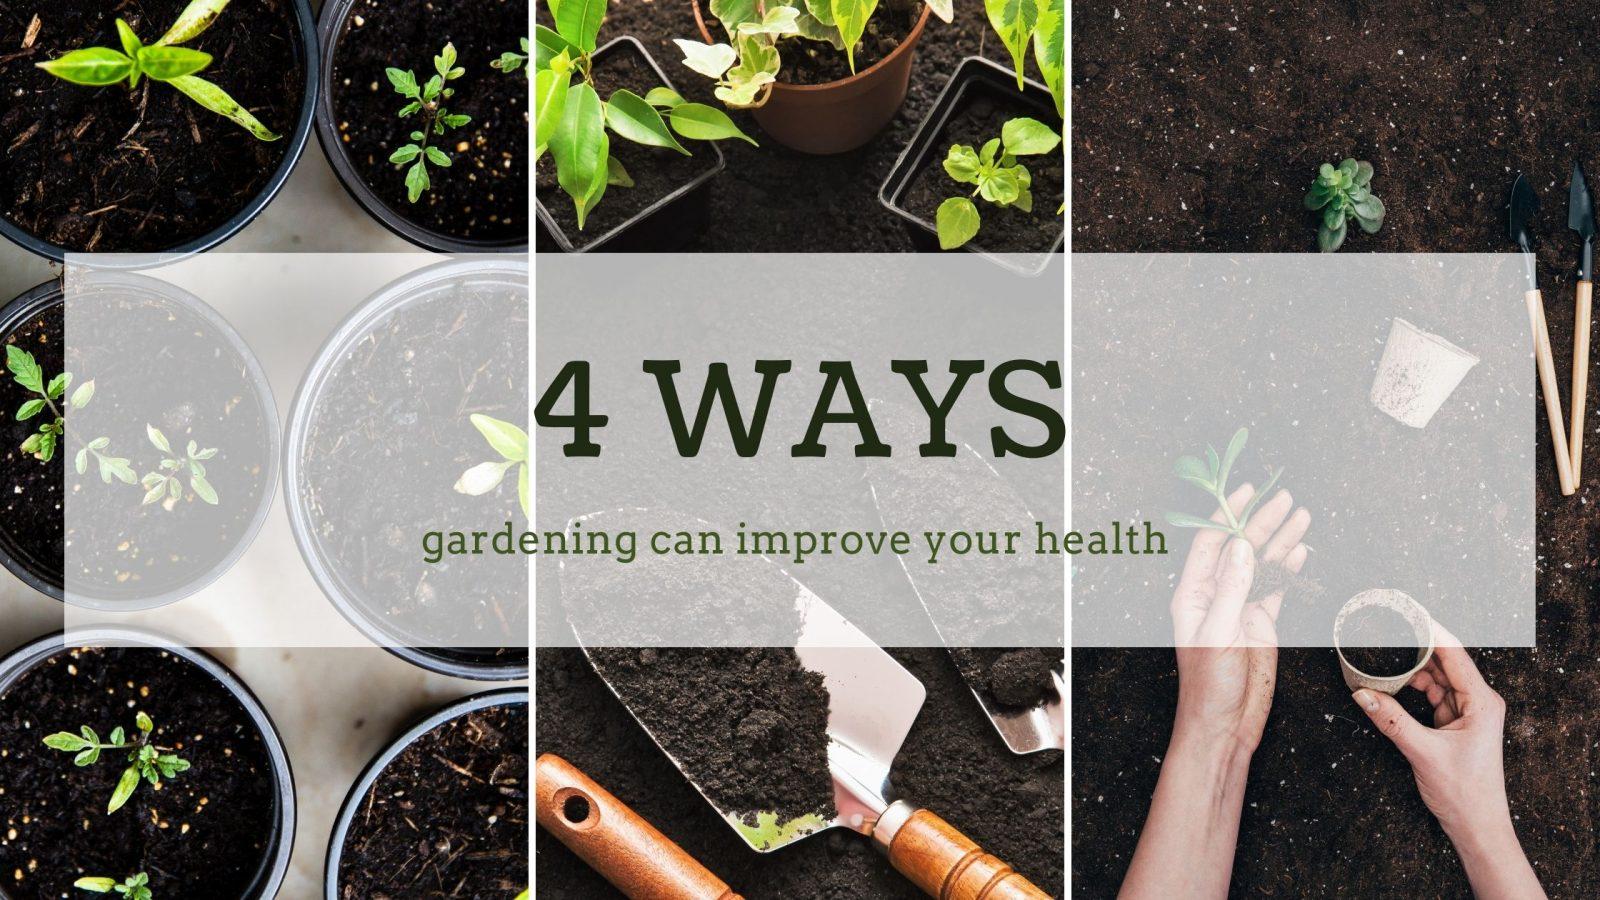 4 ways gardening improves your health